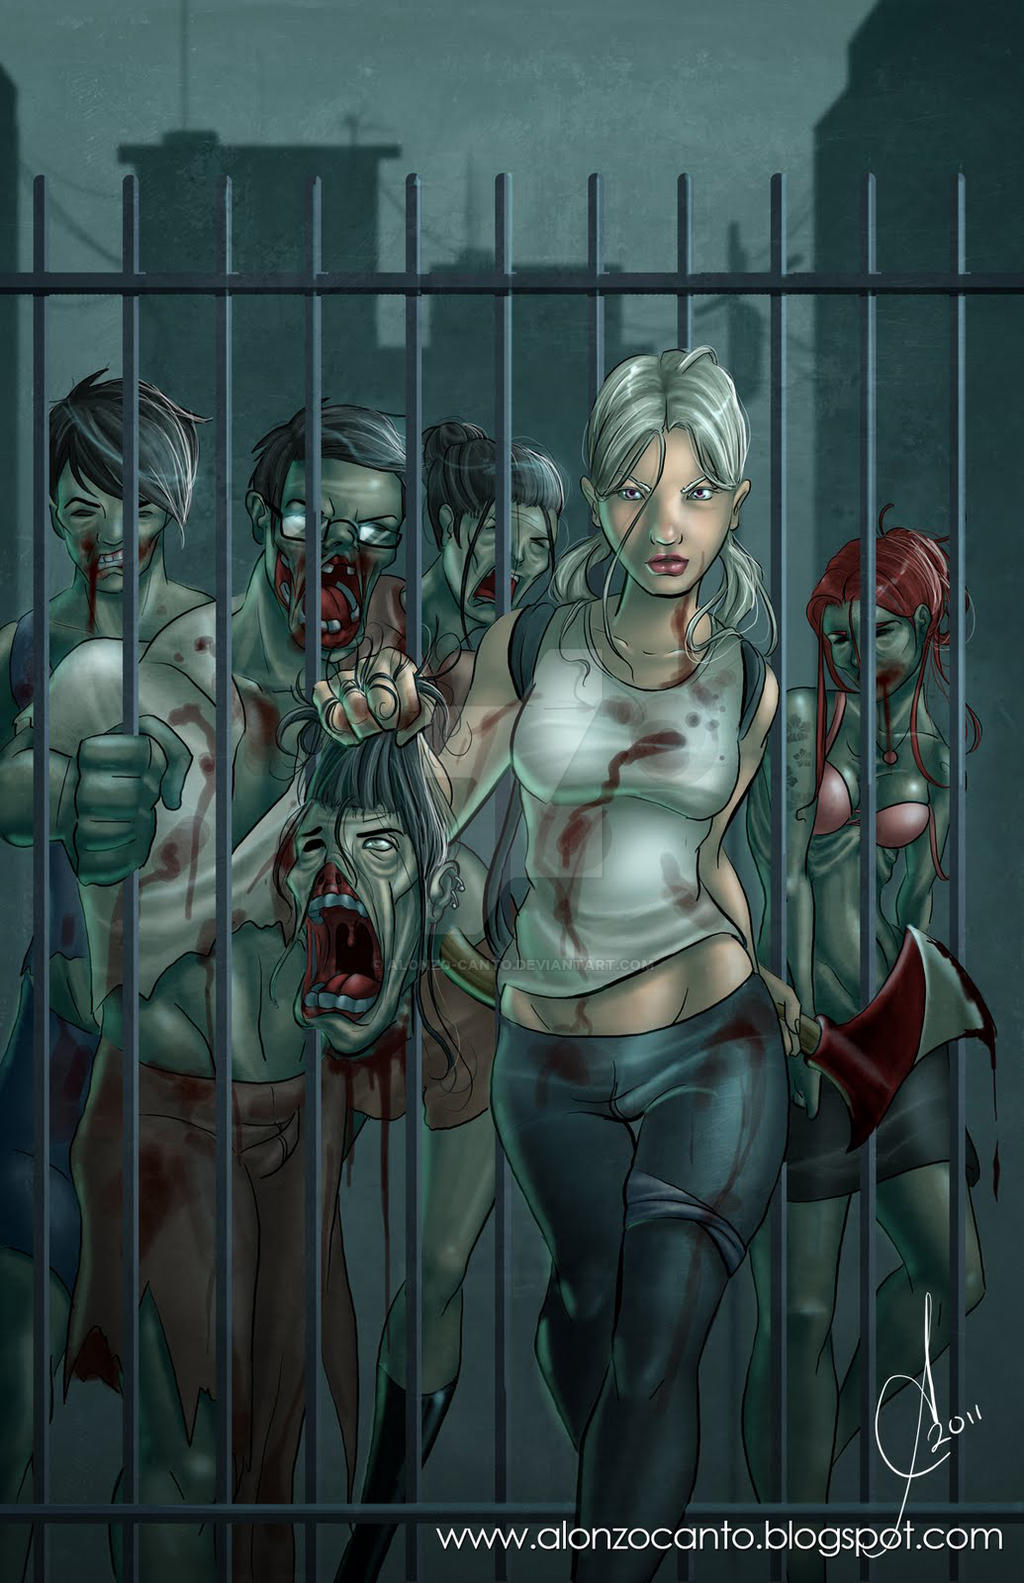 Envyq00 63 6 Zombie Slayer By Alonzocanto